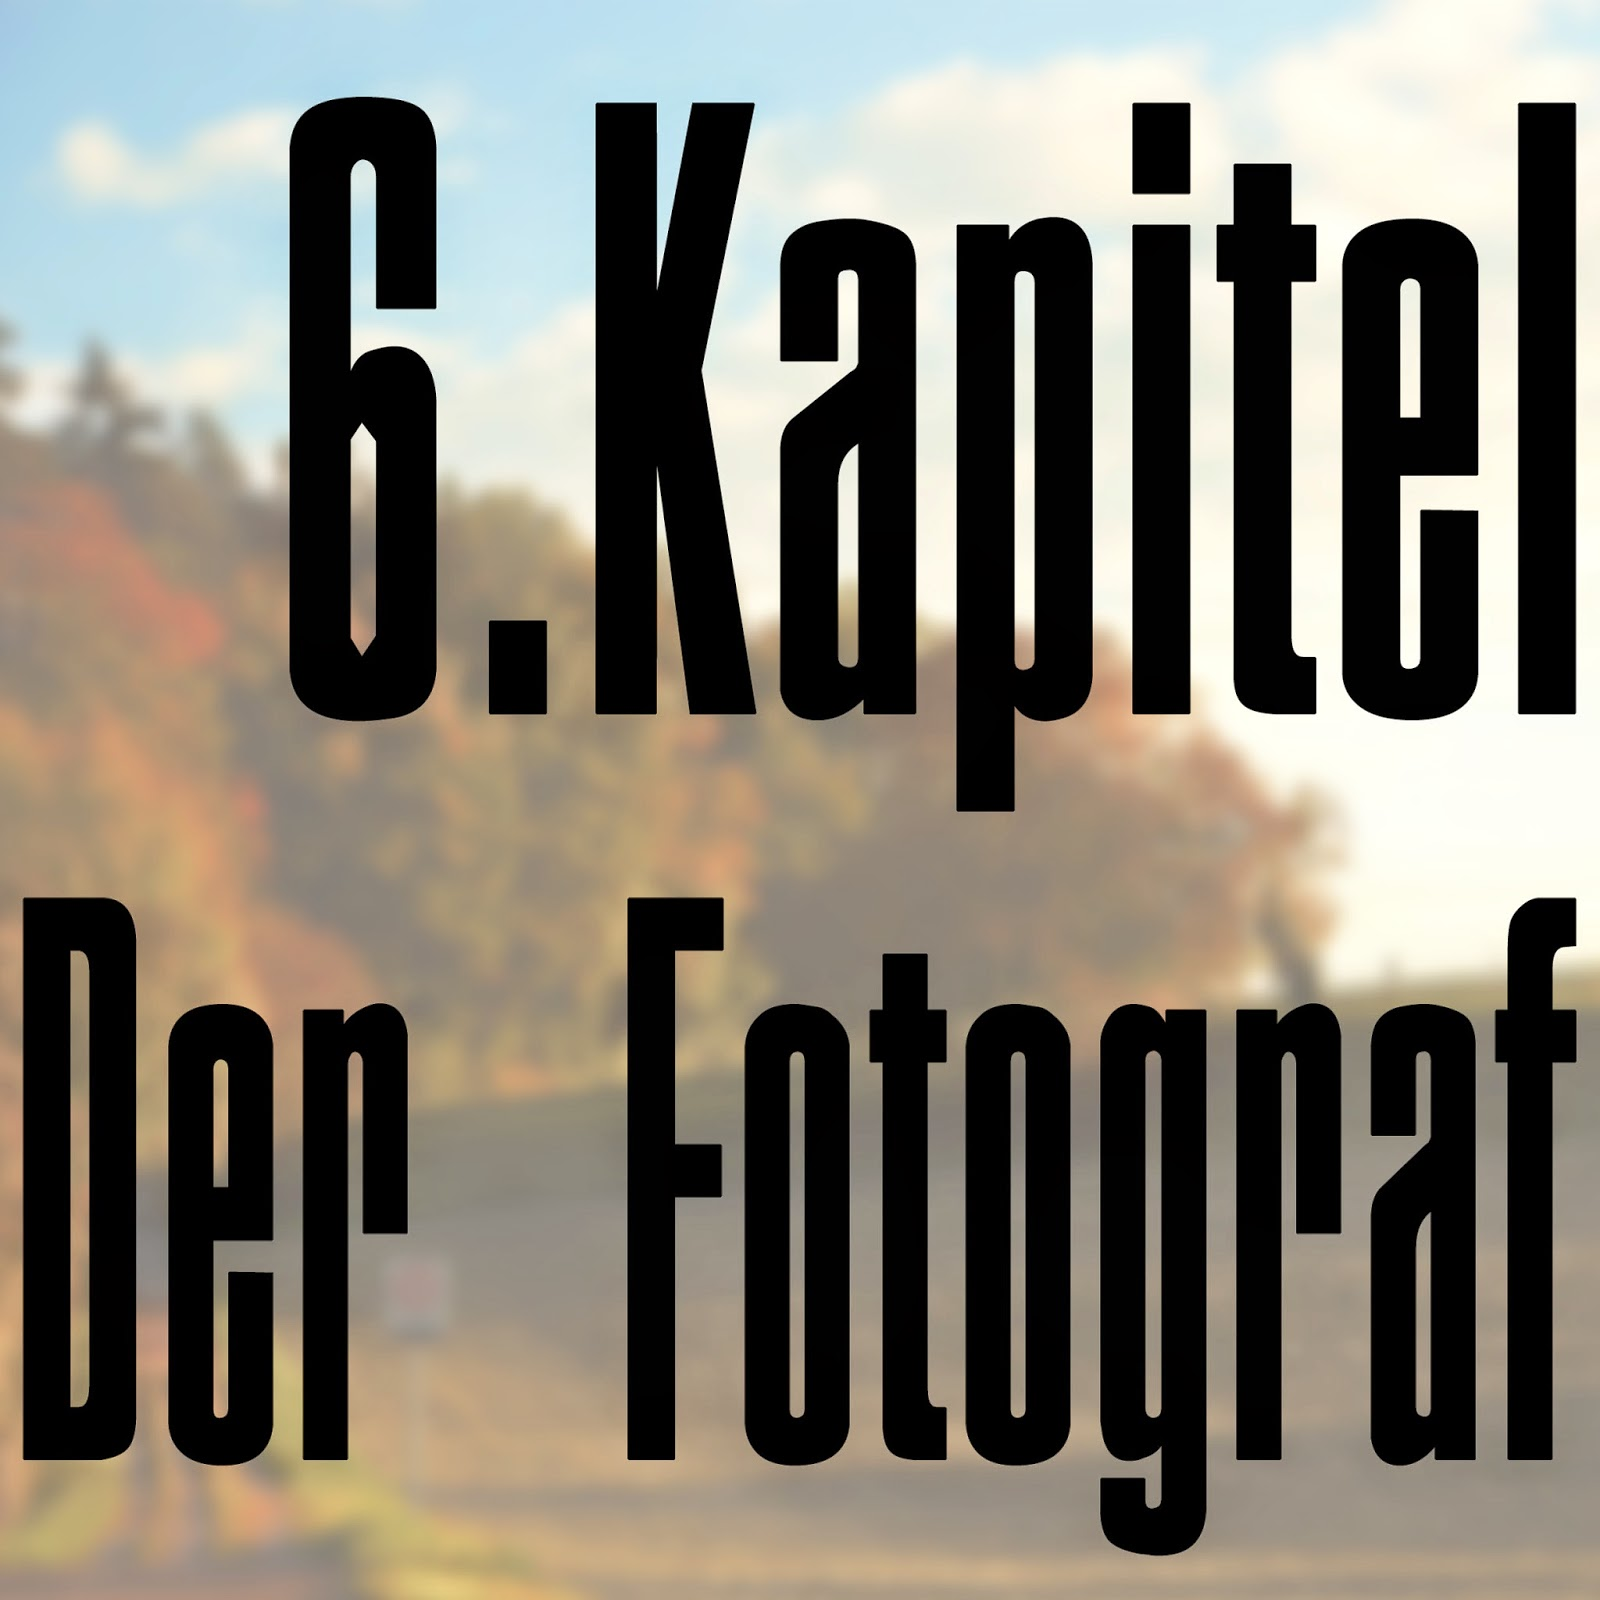 Foto, fotografieren, Bild, Abenteuer, Photo, photograph, picture, adventure